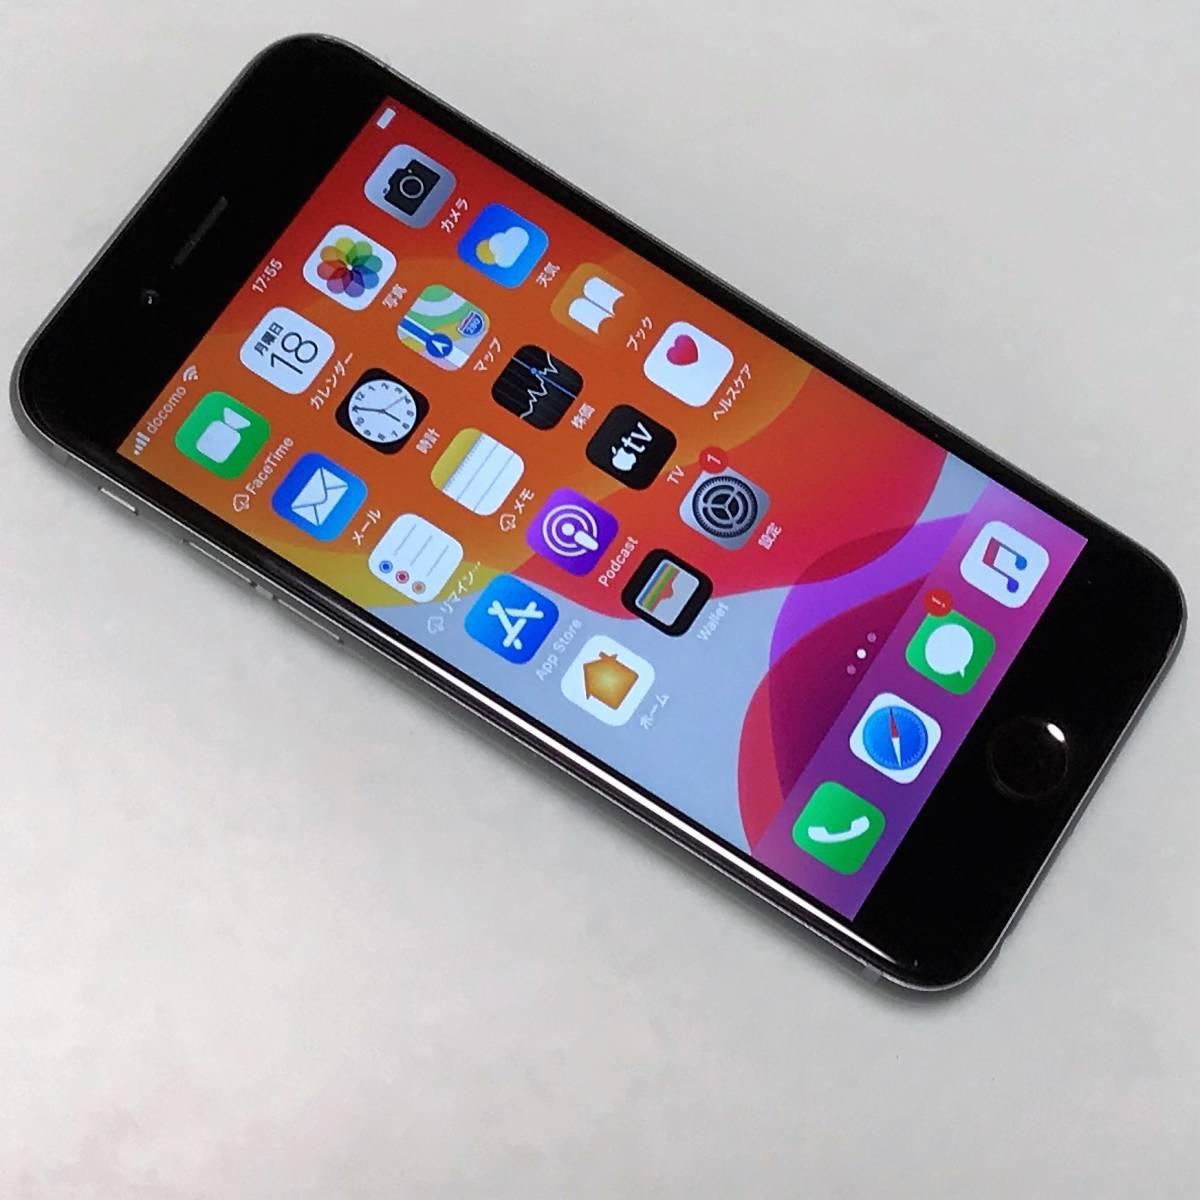 SIMフリー iPhone 6S スペースグレイ 128GB MKQT2J/A バッテリー容量100% アクティベーションロック解除済 docomo MVNO可 SIMロック解除済